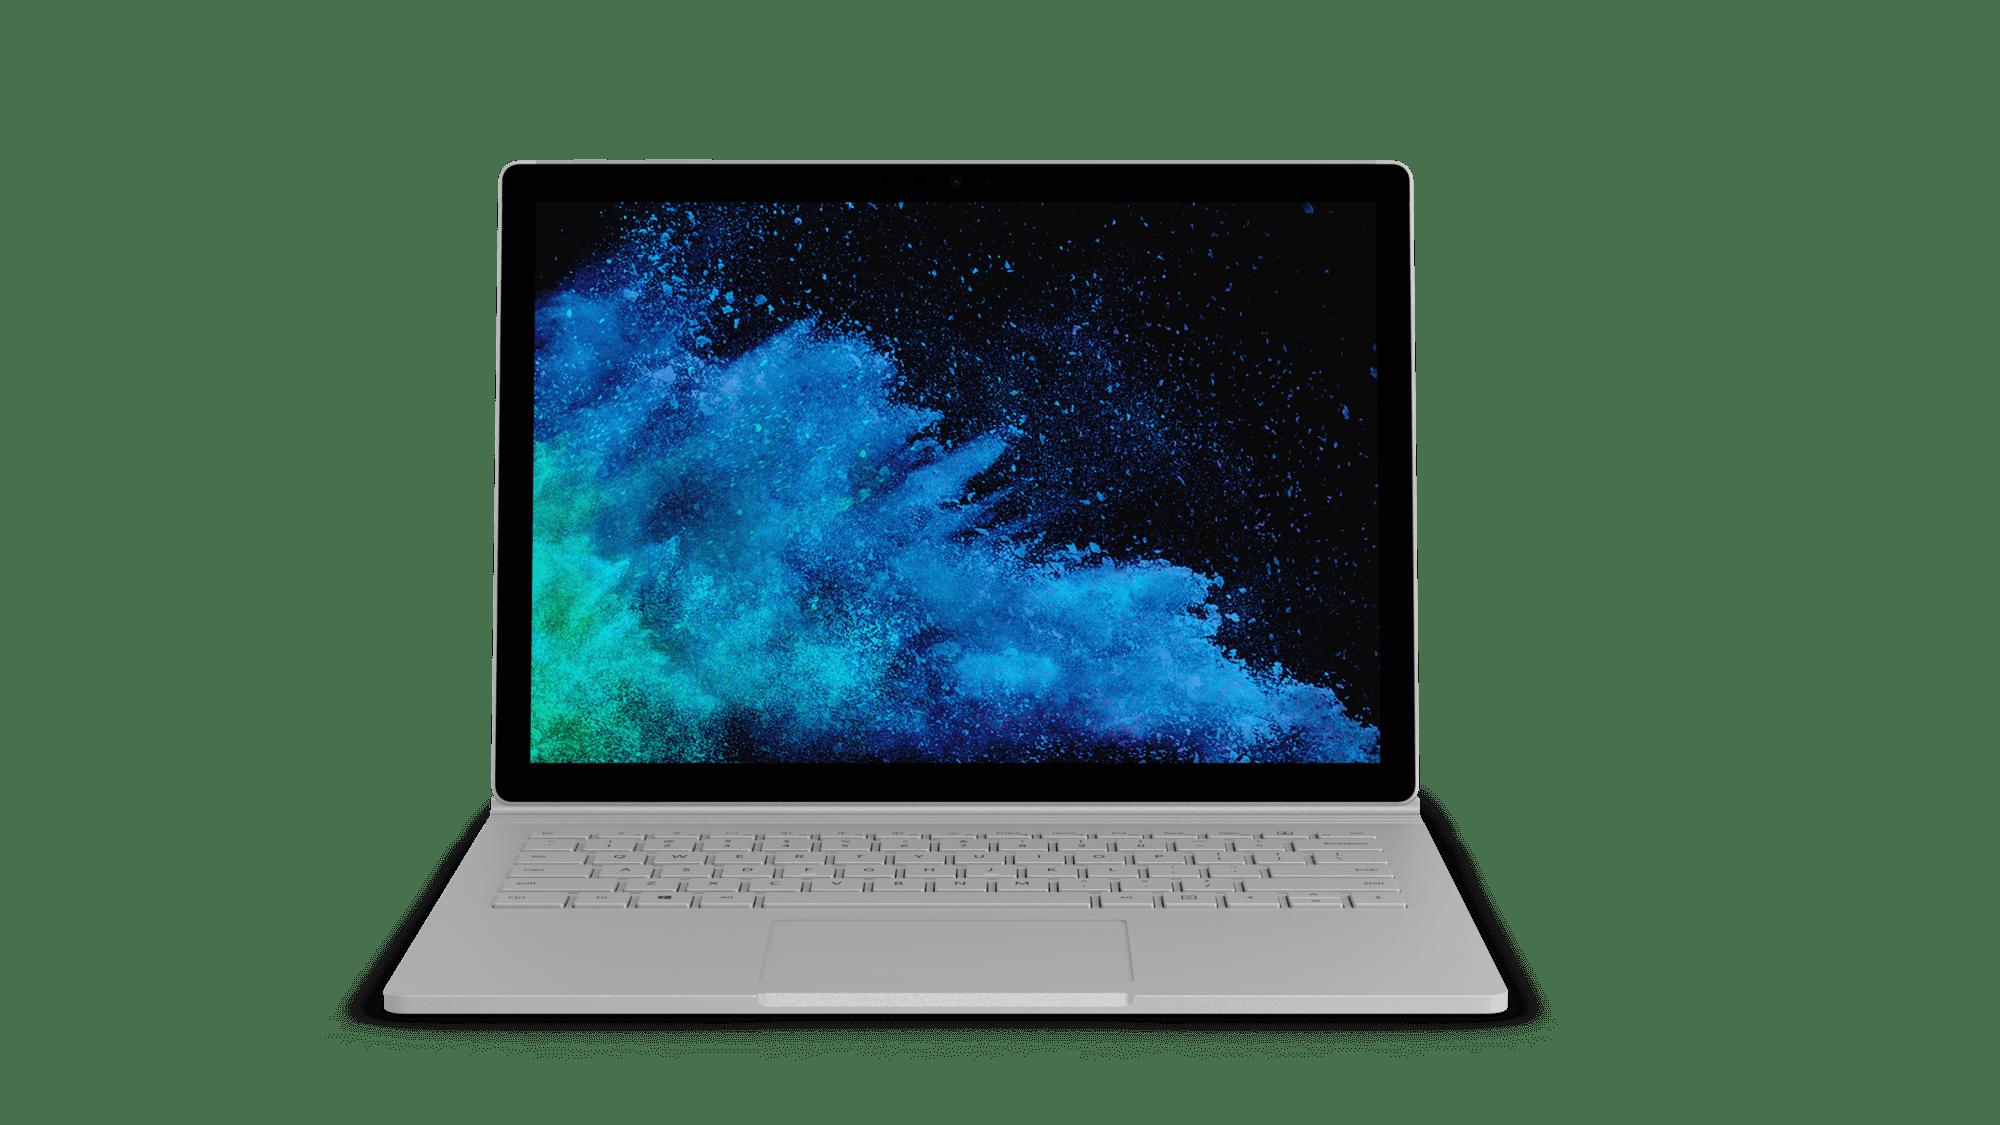 Microsoft Surface Book 2, i7, 16 GB, 1 TB SSD, GTX 1050 2 GB ...